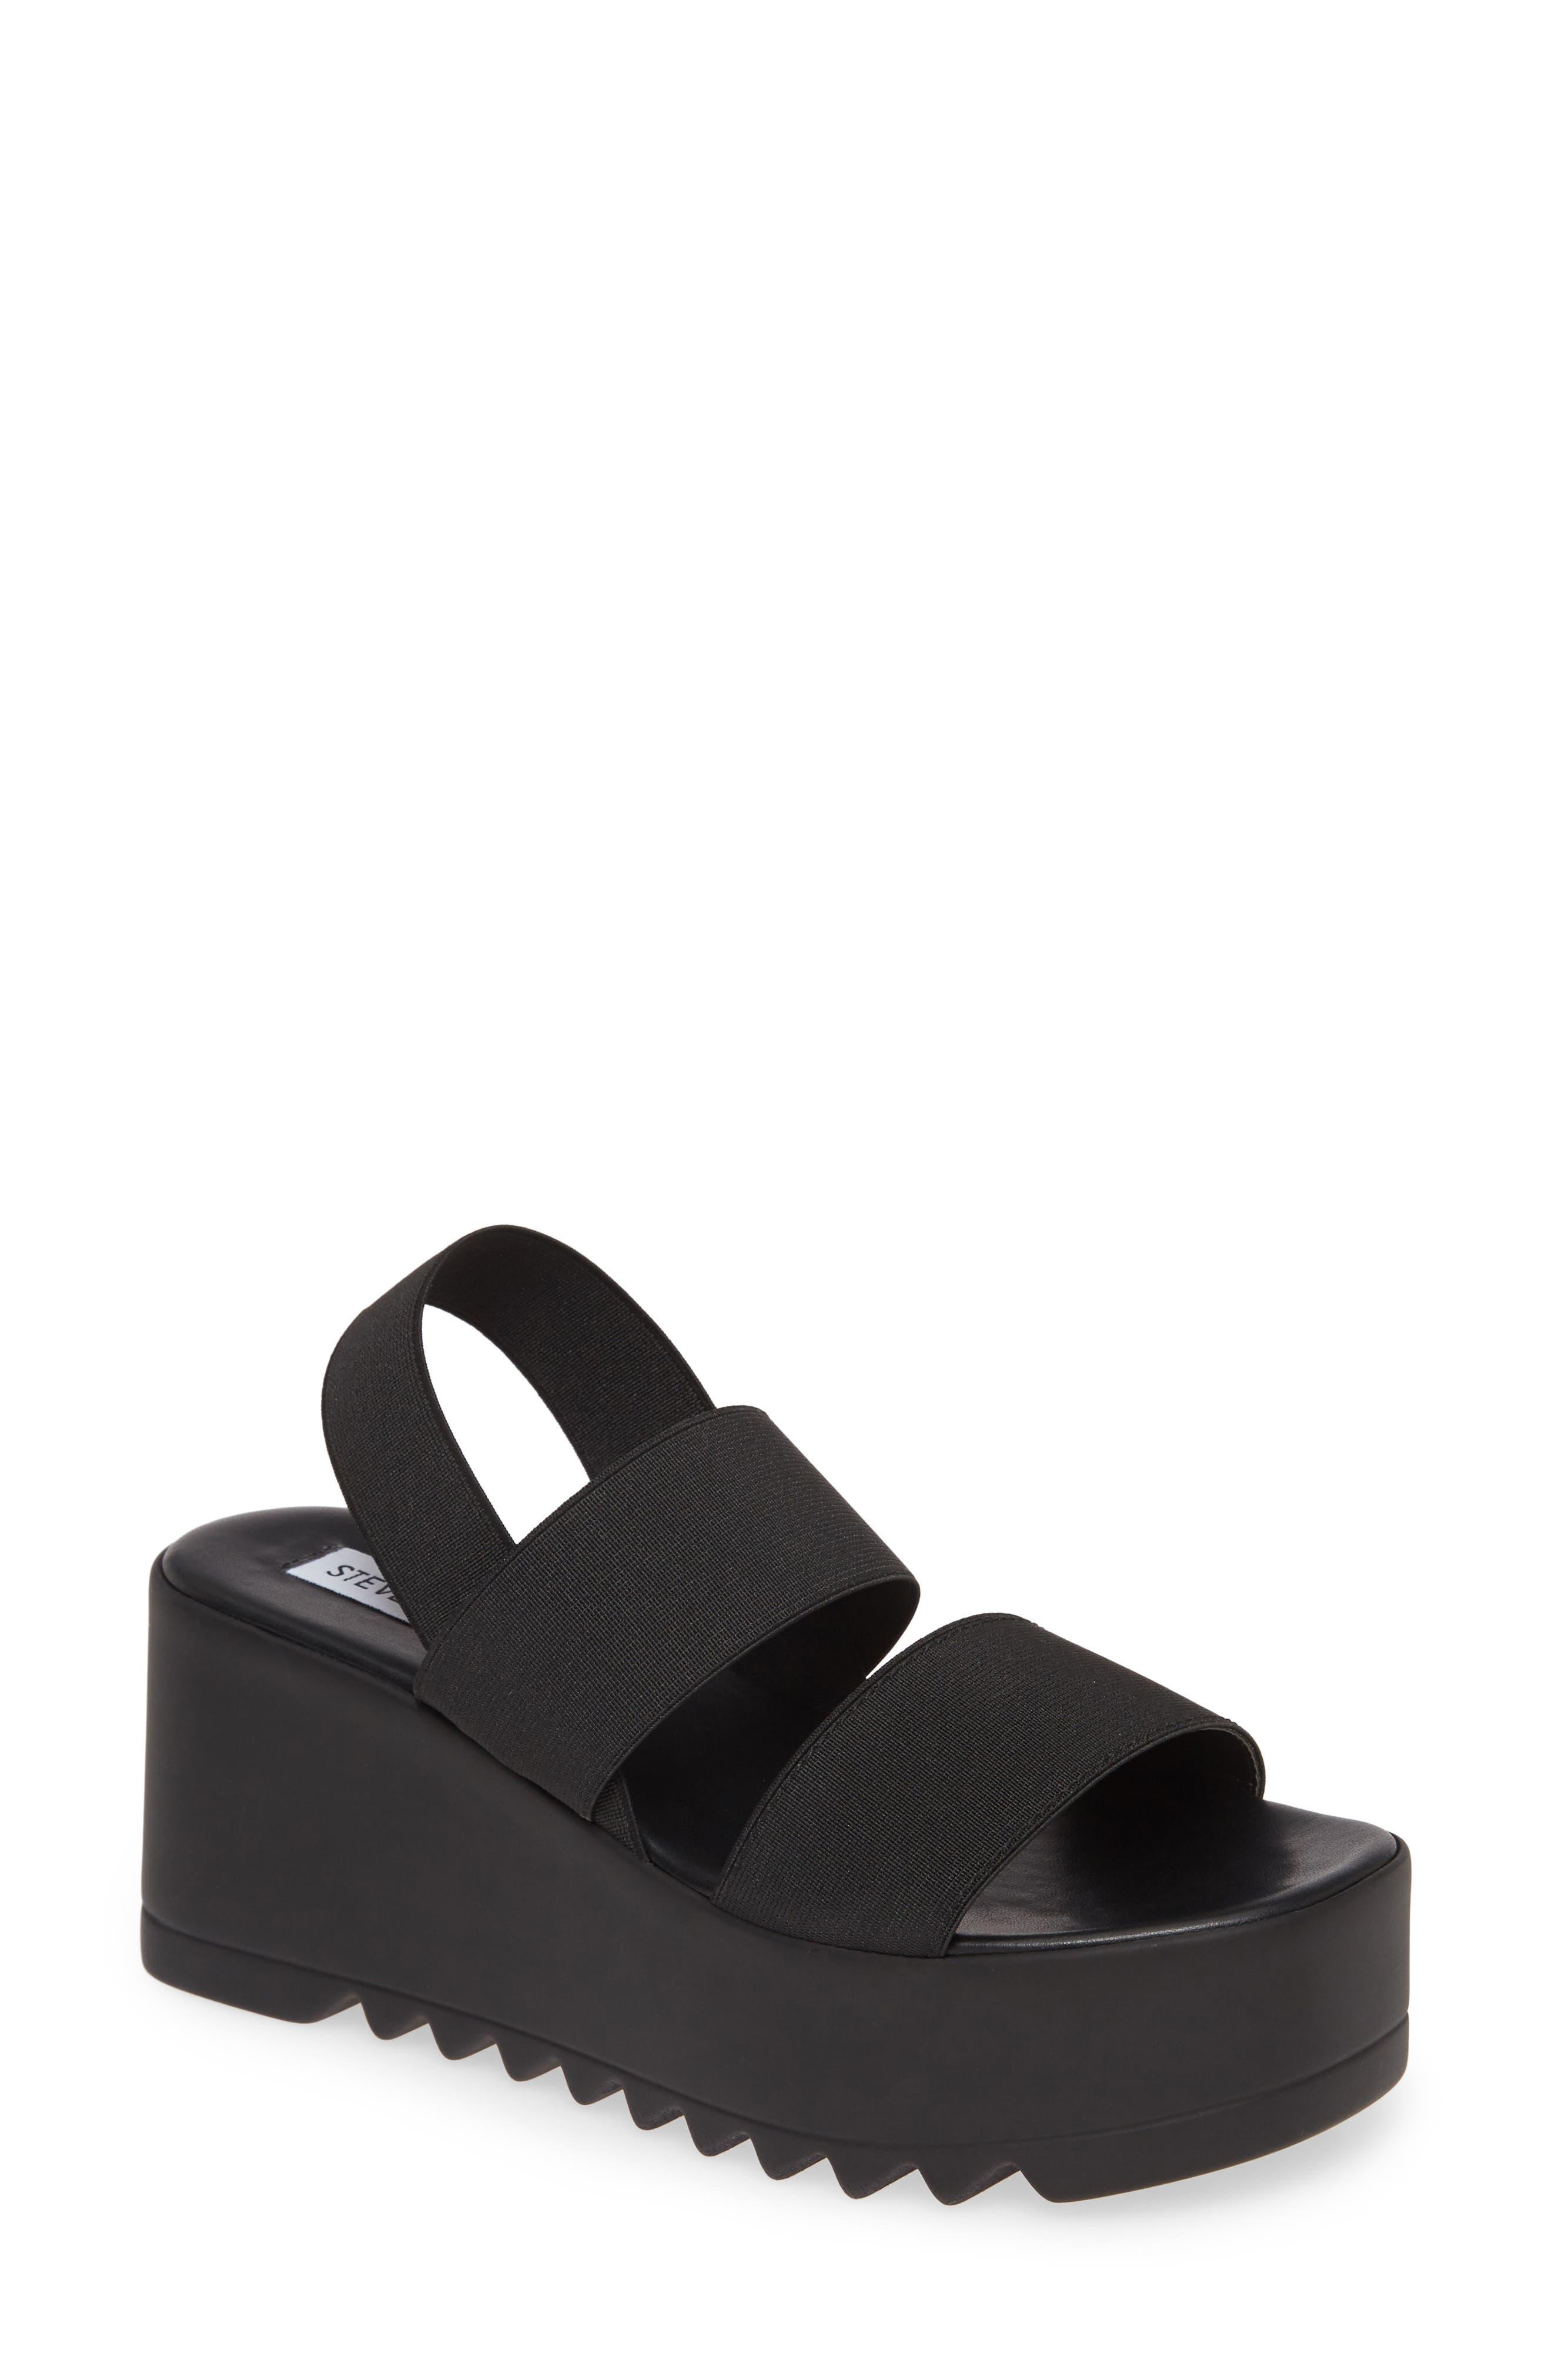 steve madden black and white platform sandals